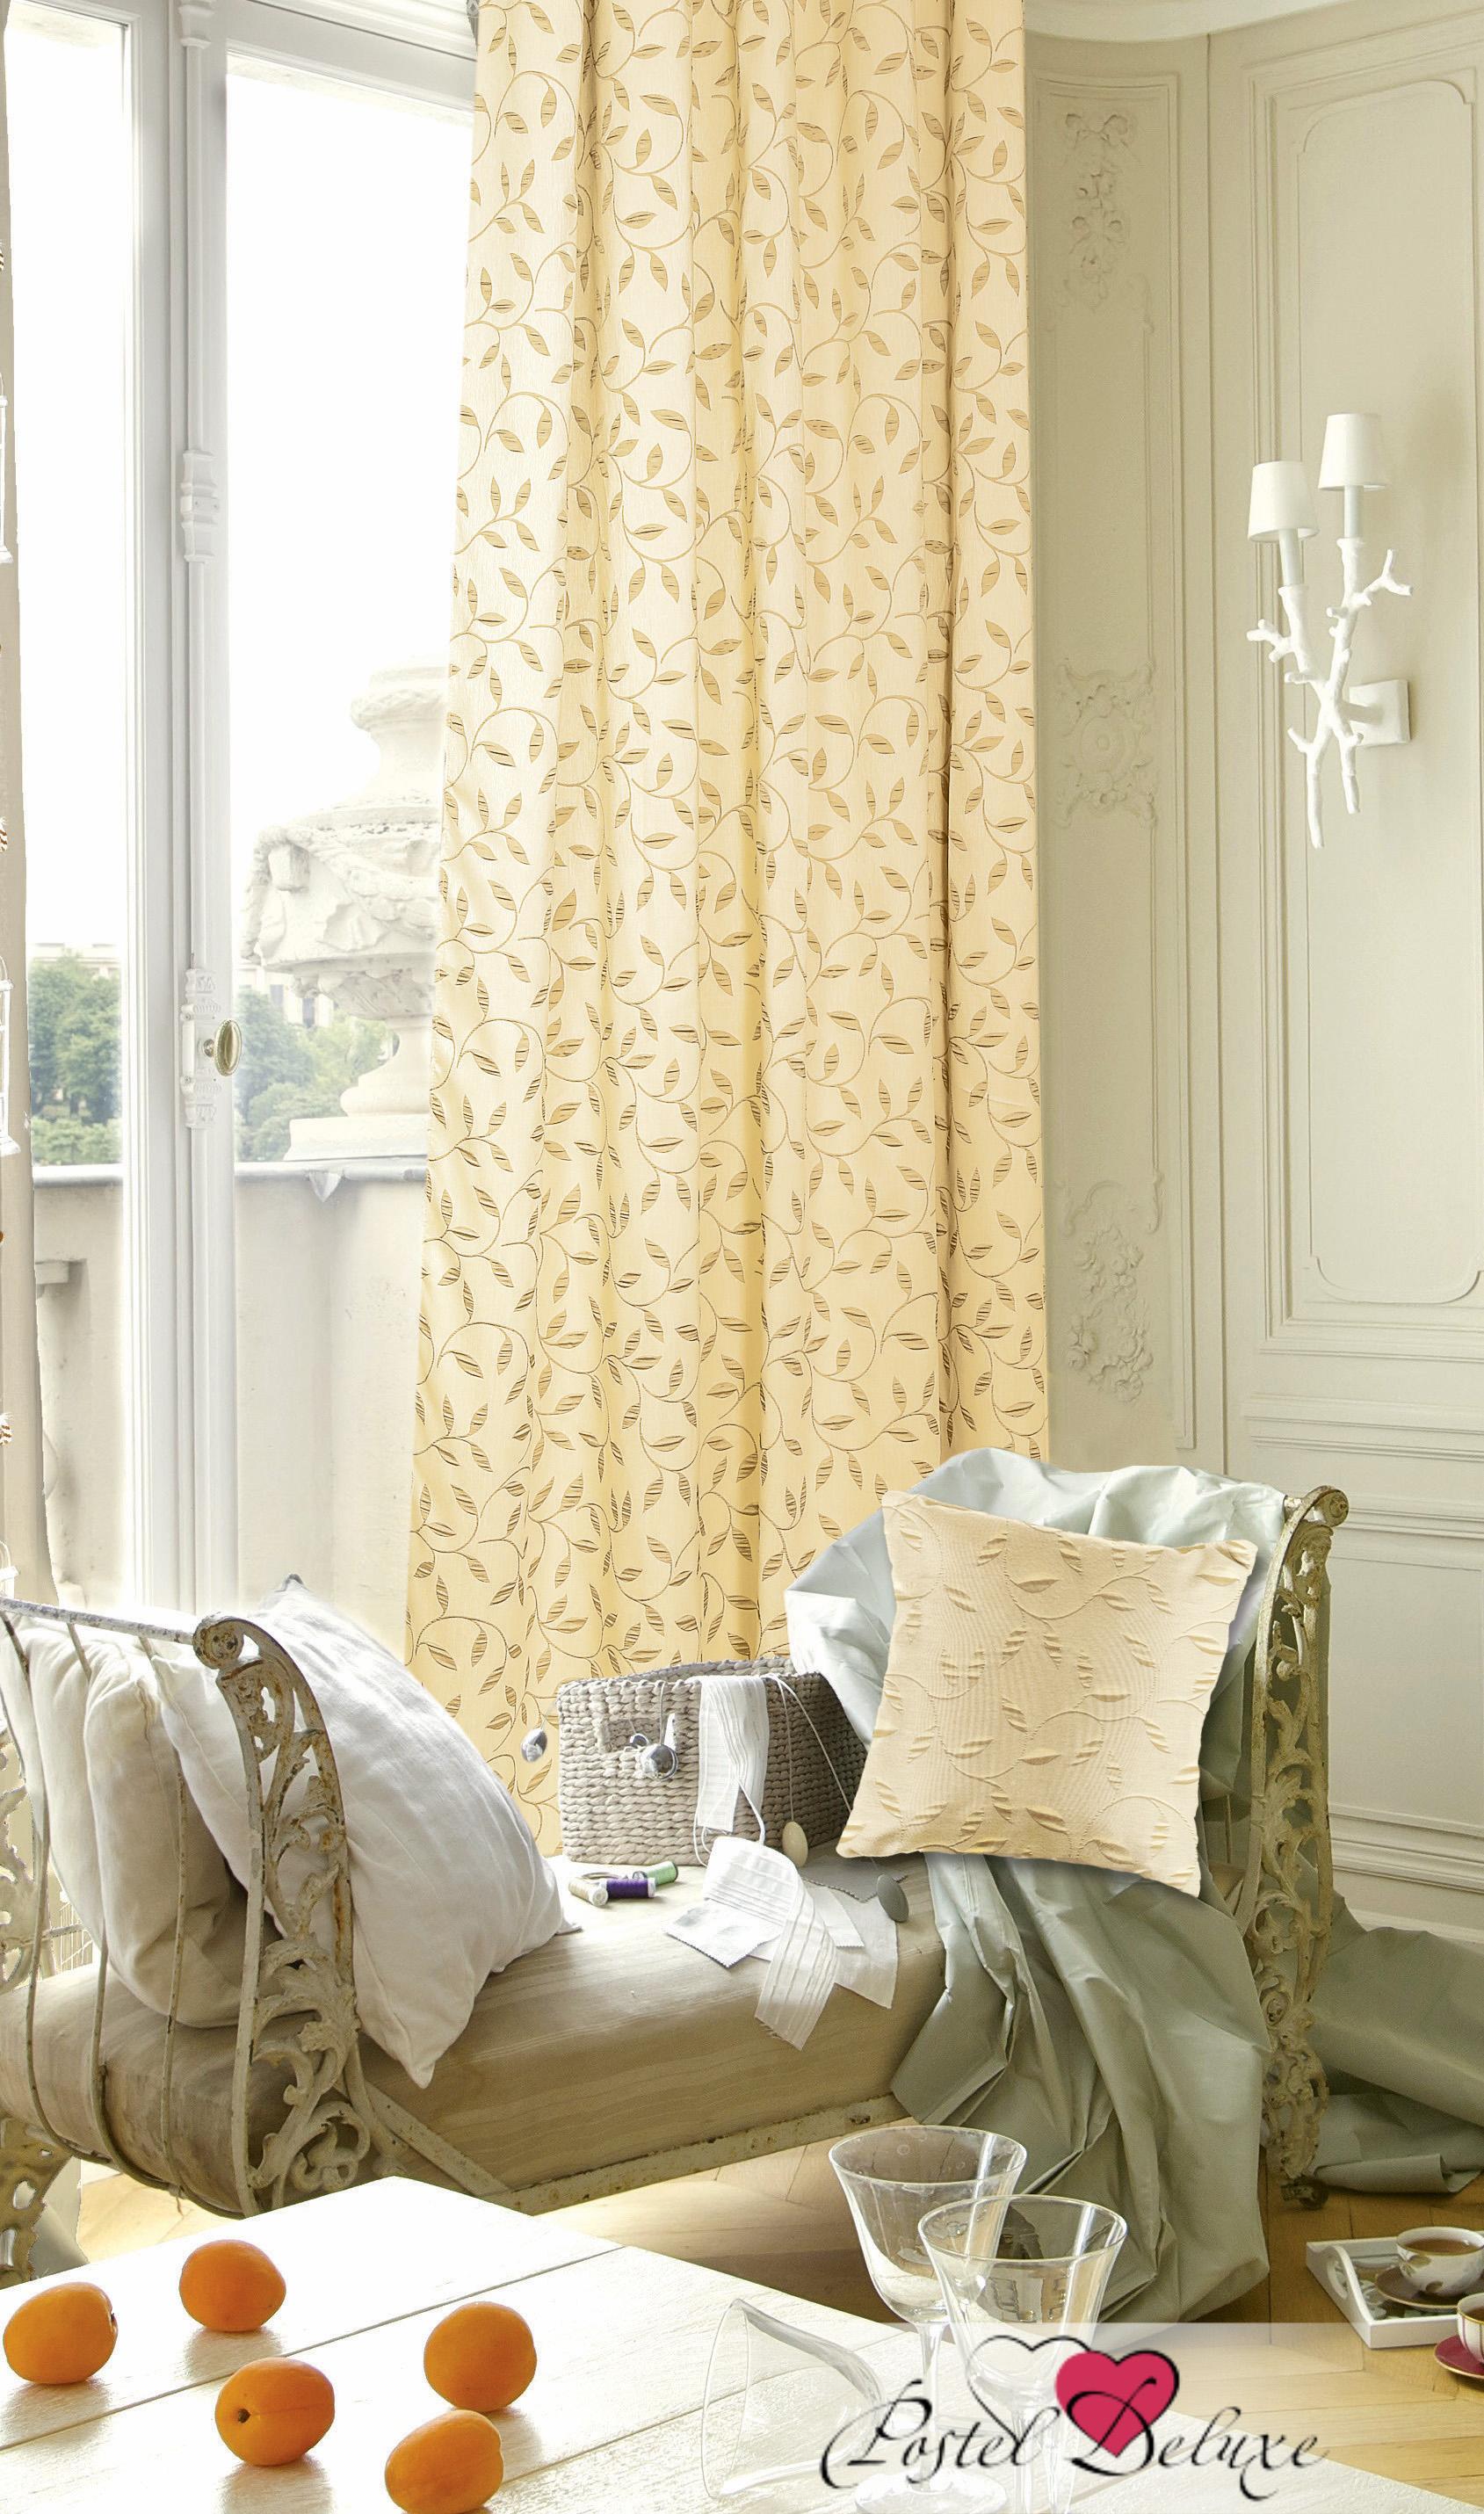 Купить Шторы Garden, Классические шторы Belle Цвет: Желтый, Турция, Жаккард